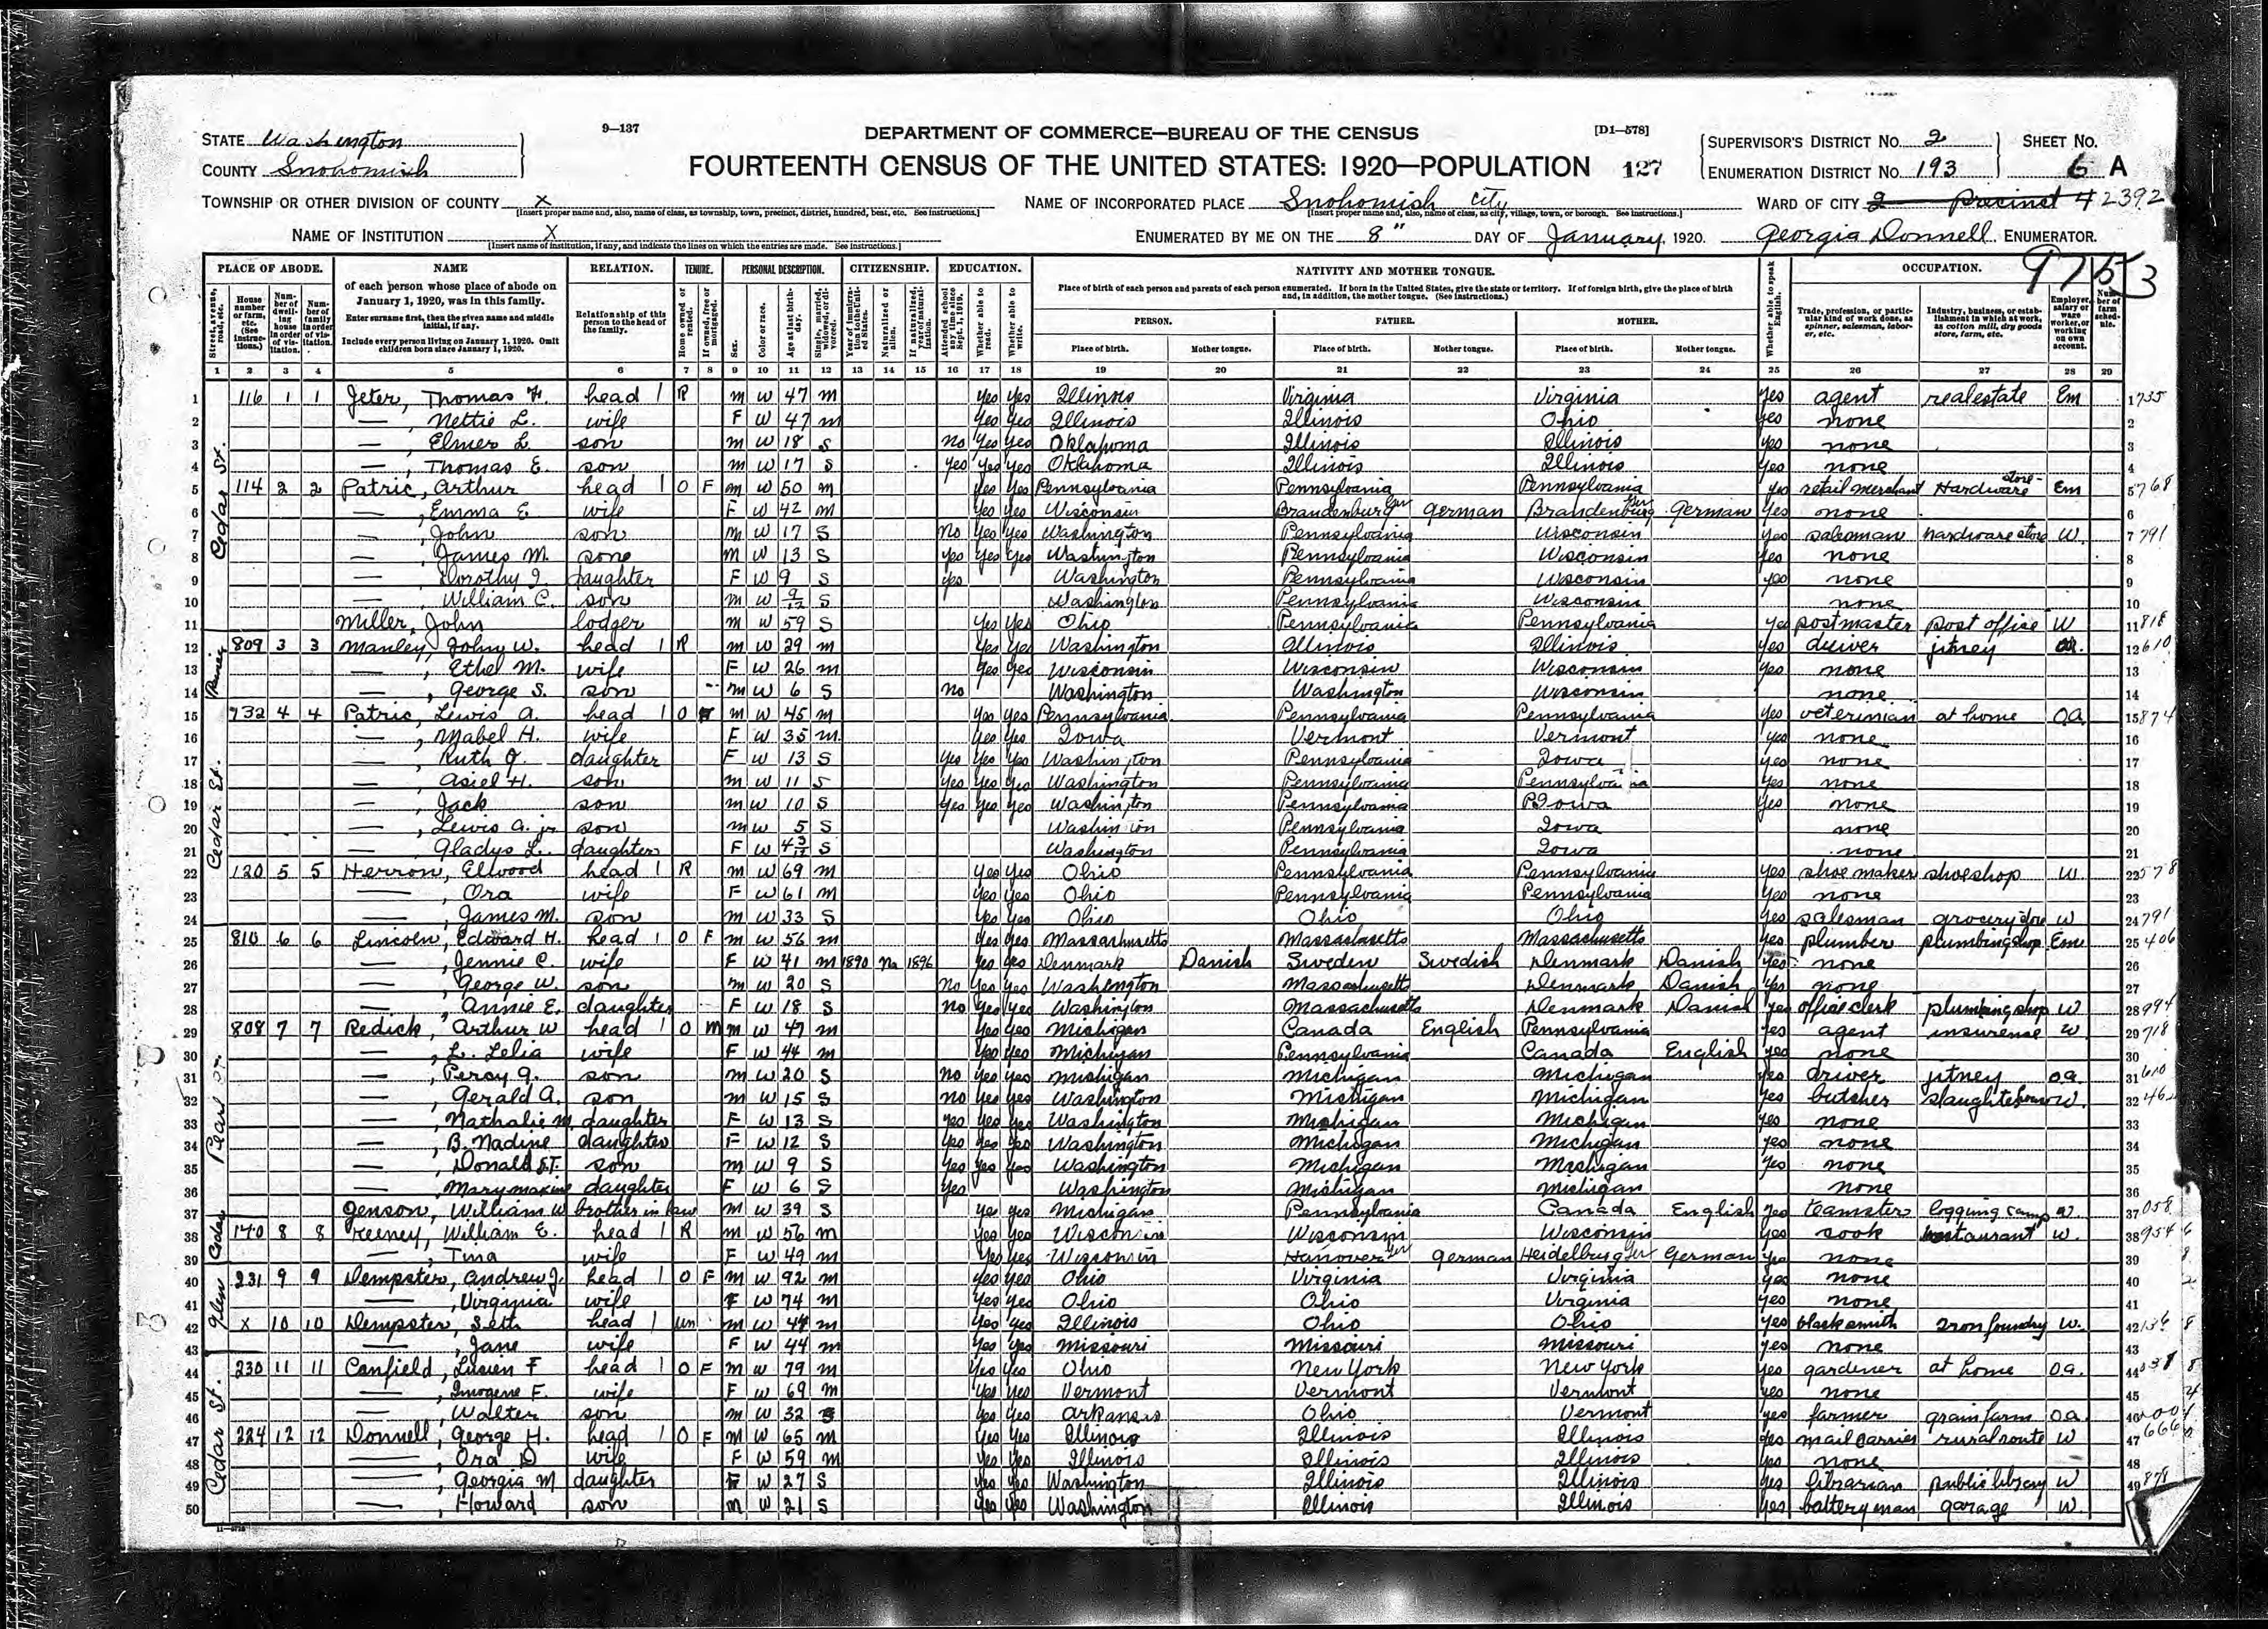 File:1920 US census form for 2nd ward of Snohomish Washington.jpg ...